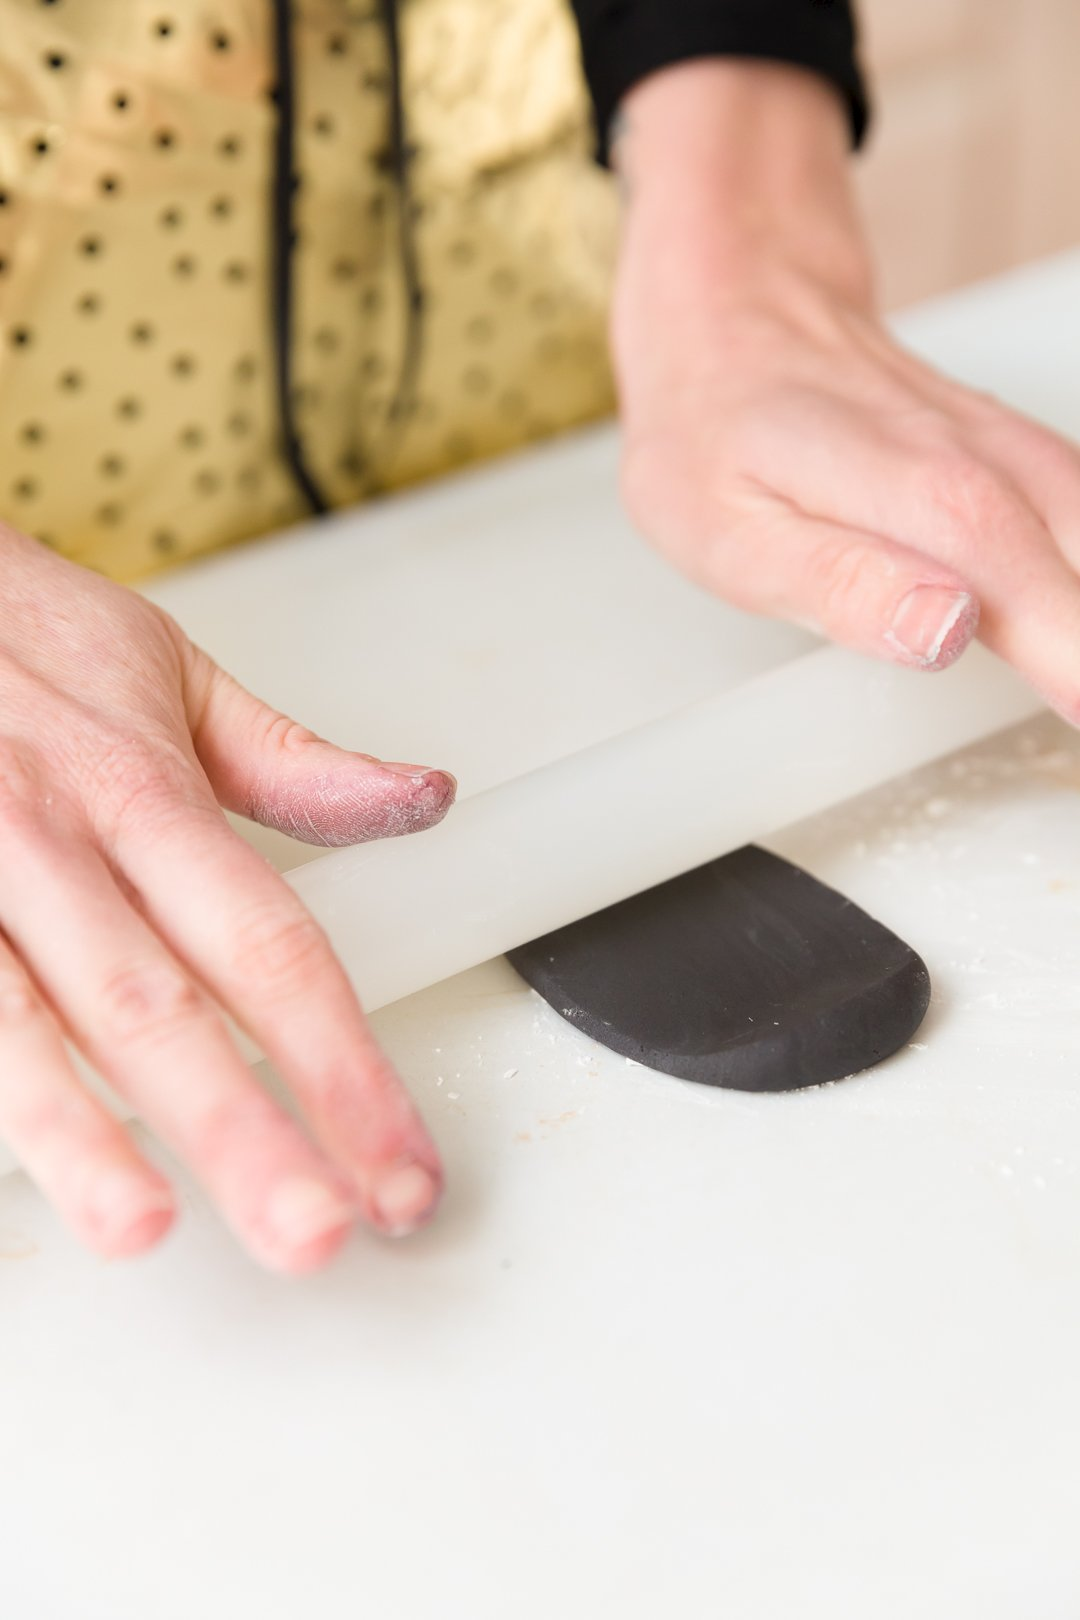 how to make black fondant out of white fondant